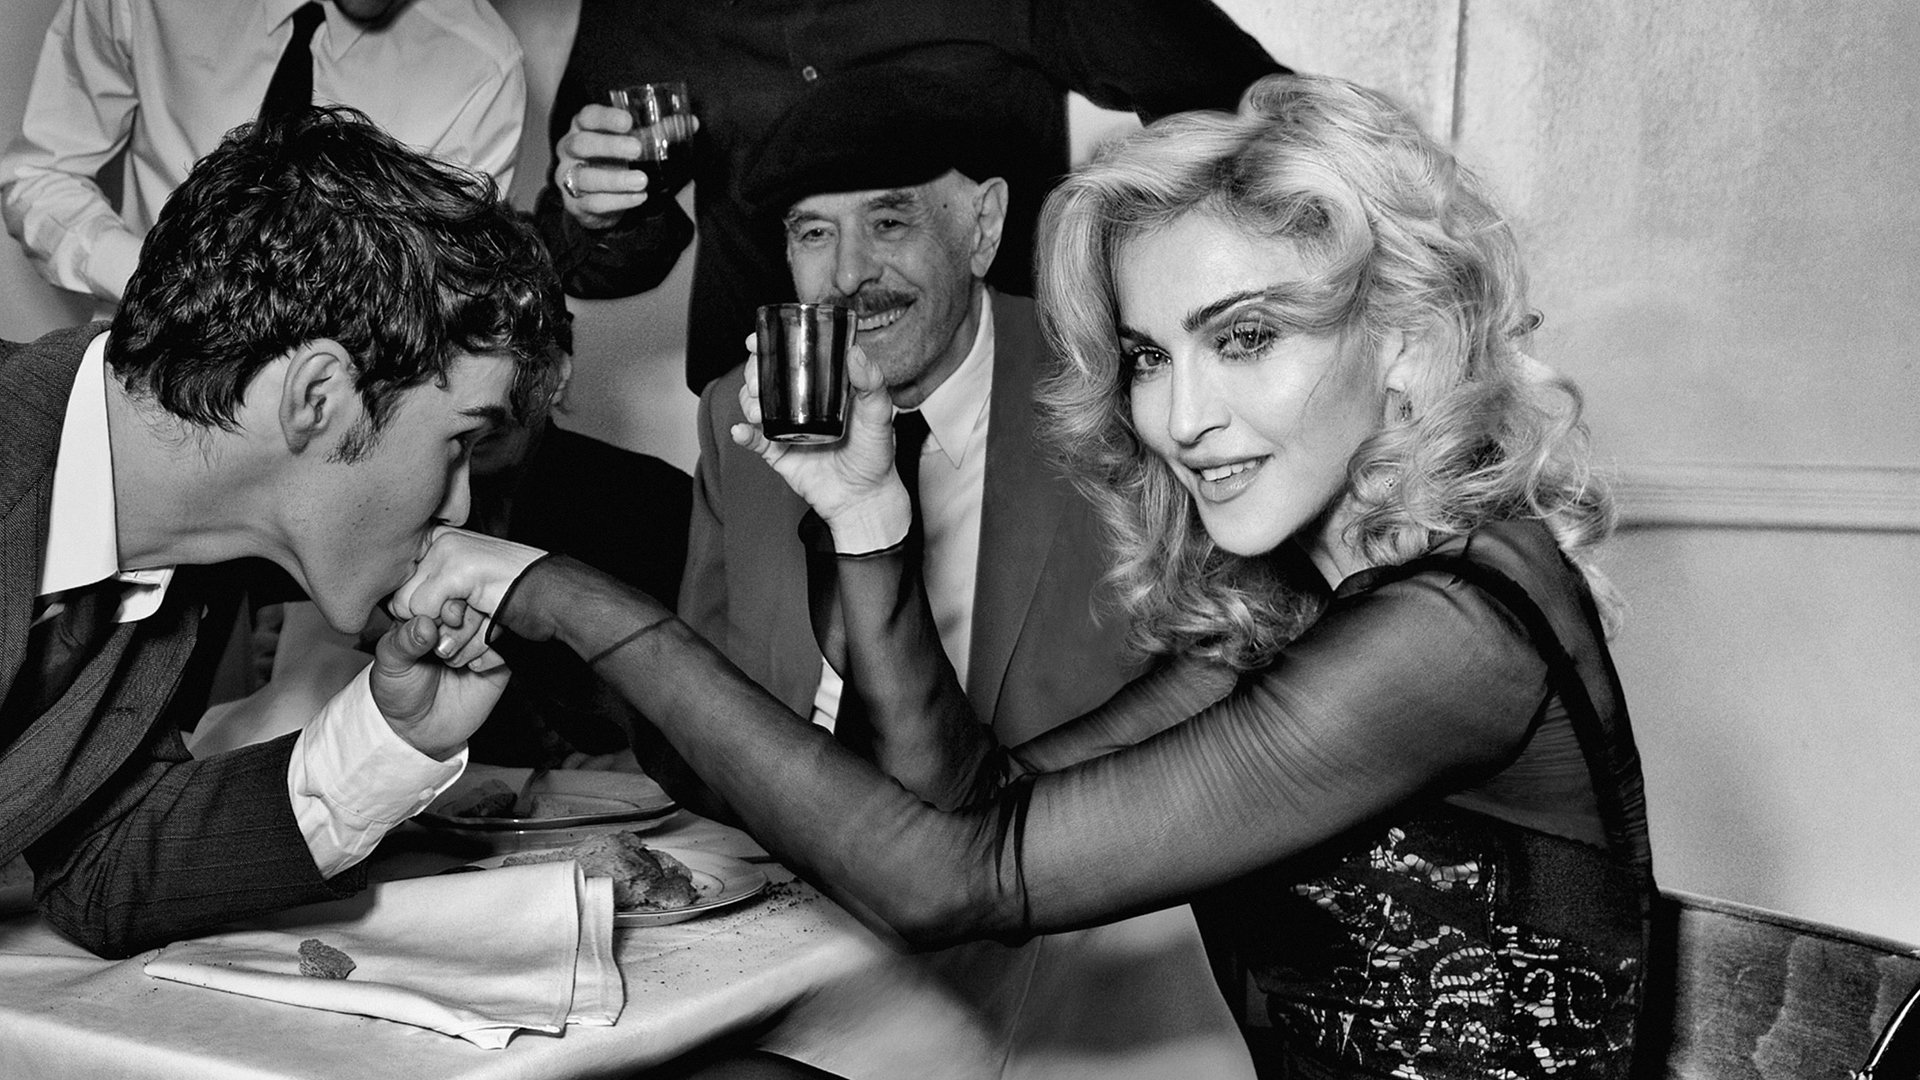 Madonna hd wallpaper background image 1920x1080 id 545497 wallpaper abyss - Madonna hd images ...